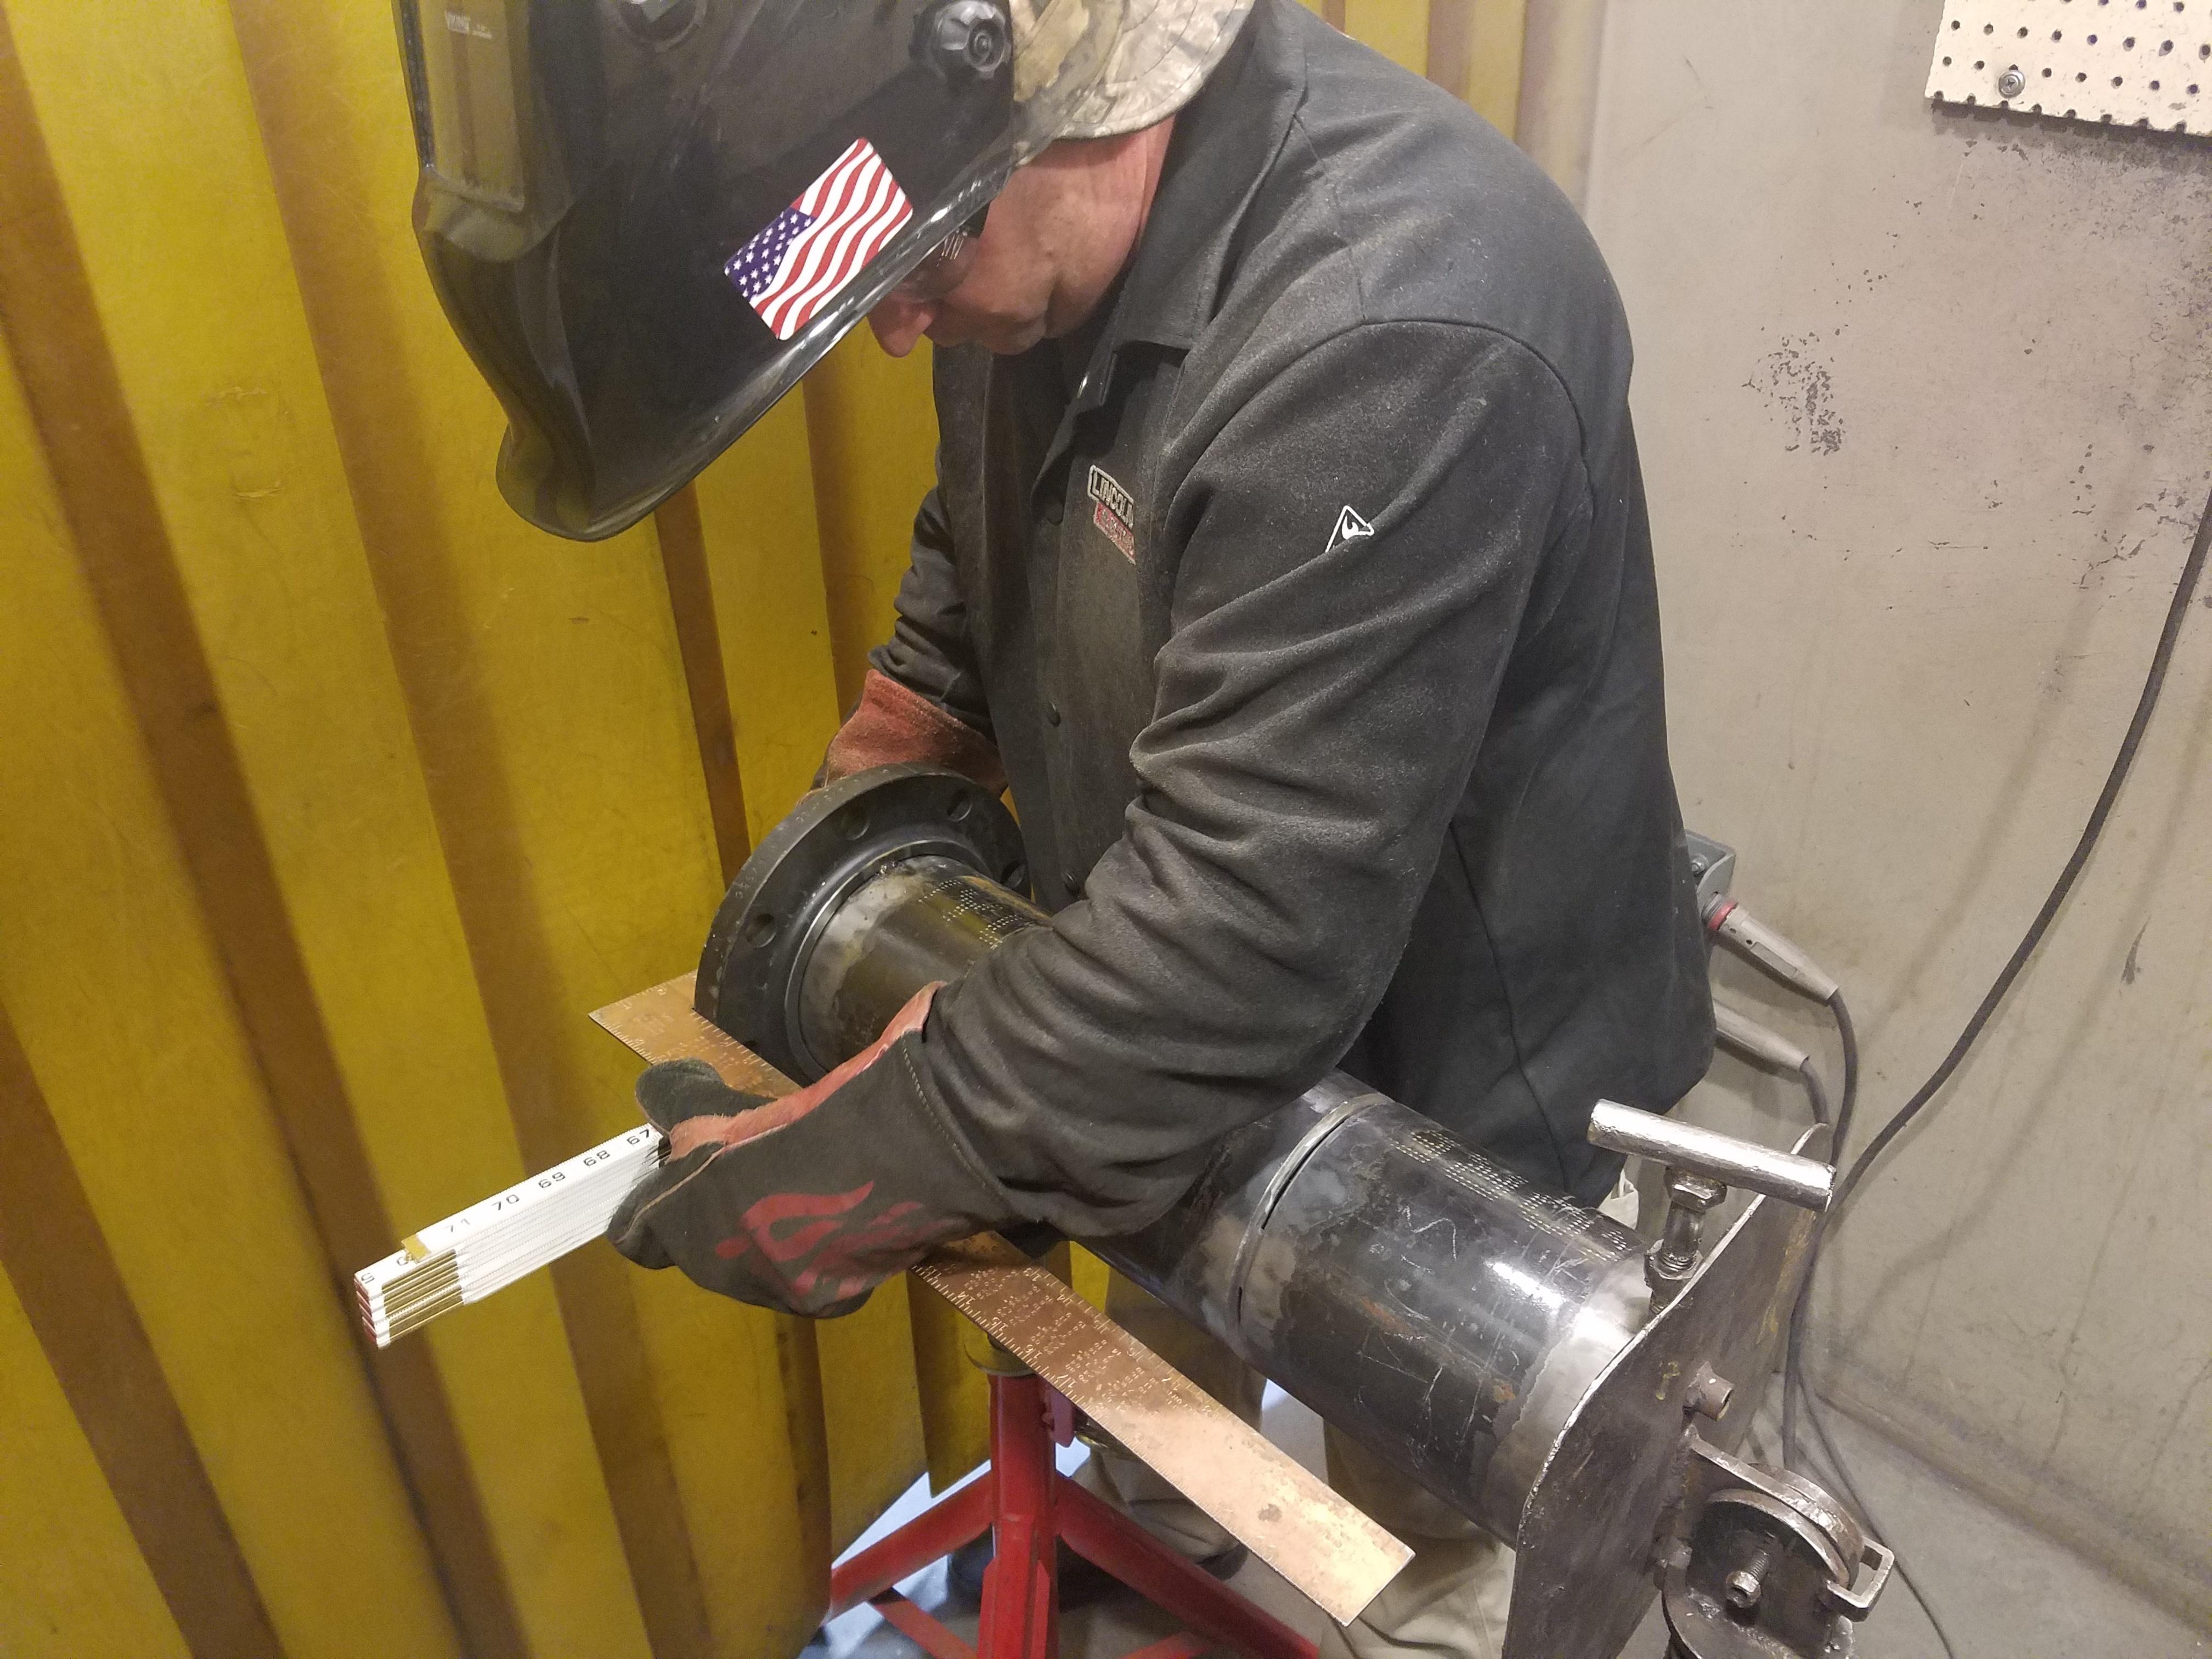 Chris Barnett gains hands-on welding experience through the UA VIP Program at JBLM